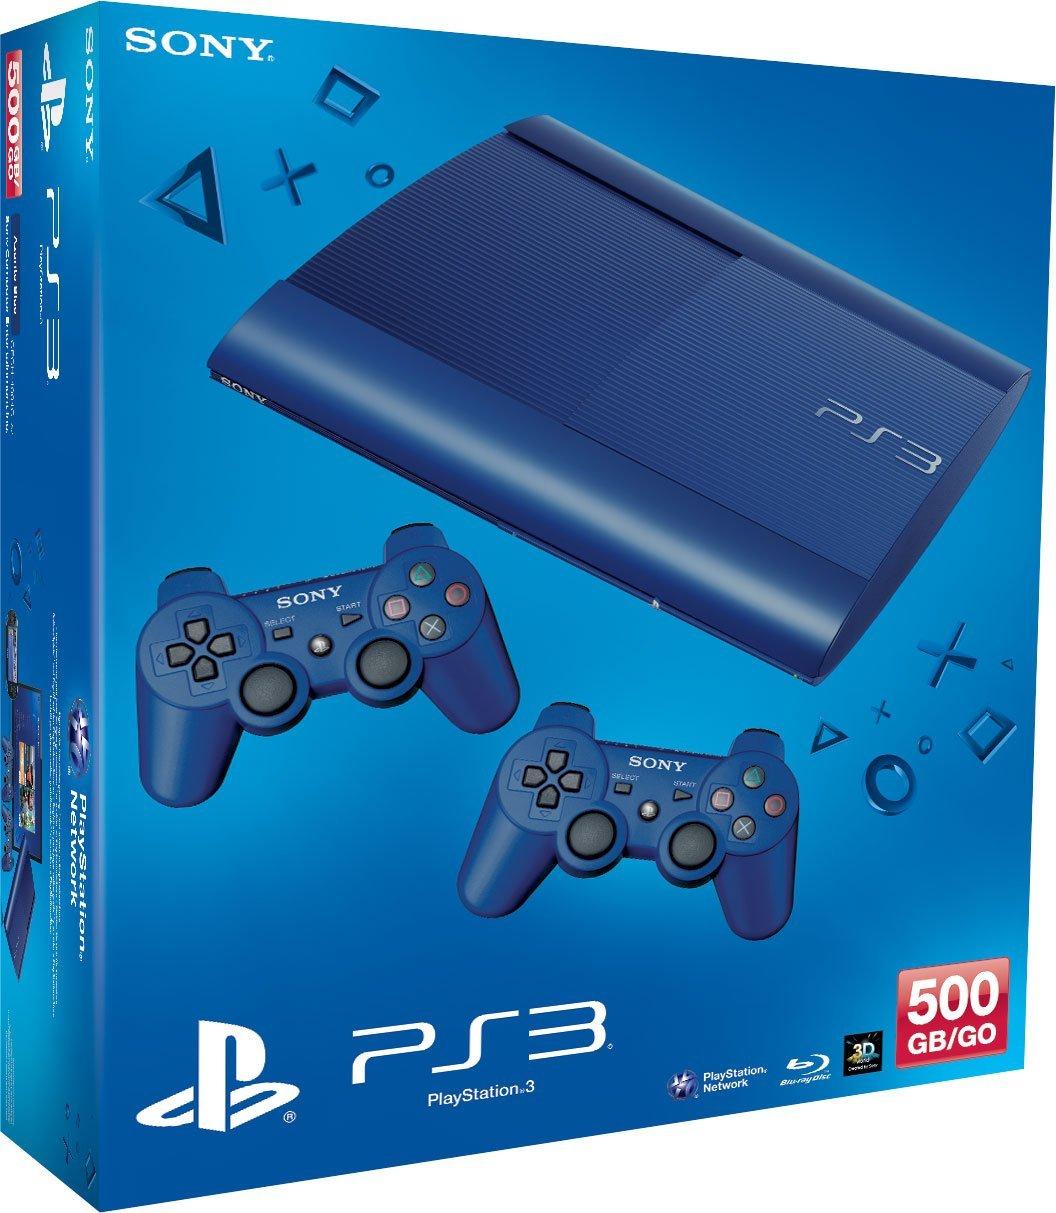 PlayStation 3 - Konsole Super Slim 500 GB weiß (inkl. 2 DualShock 3 Wireless Controller weiß)